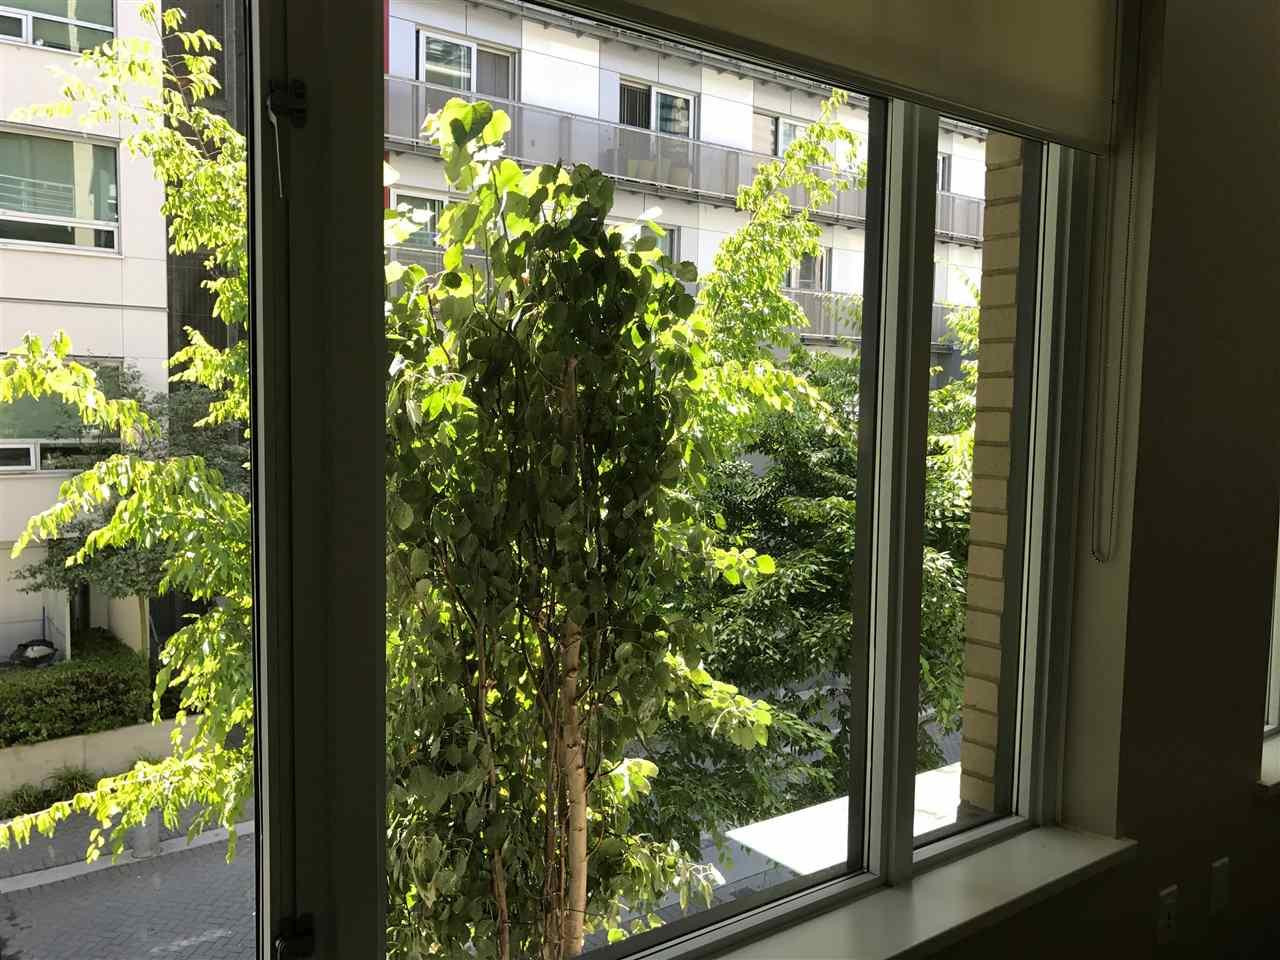 Condo Apartment at 21 77 WALTER HARDWICK AVENUE, Unit 21, Vancouver West, British Columbia. Image 12